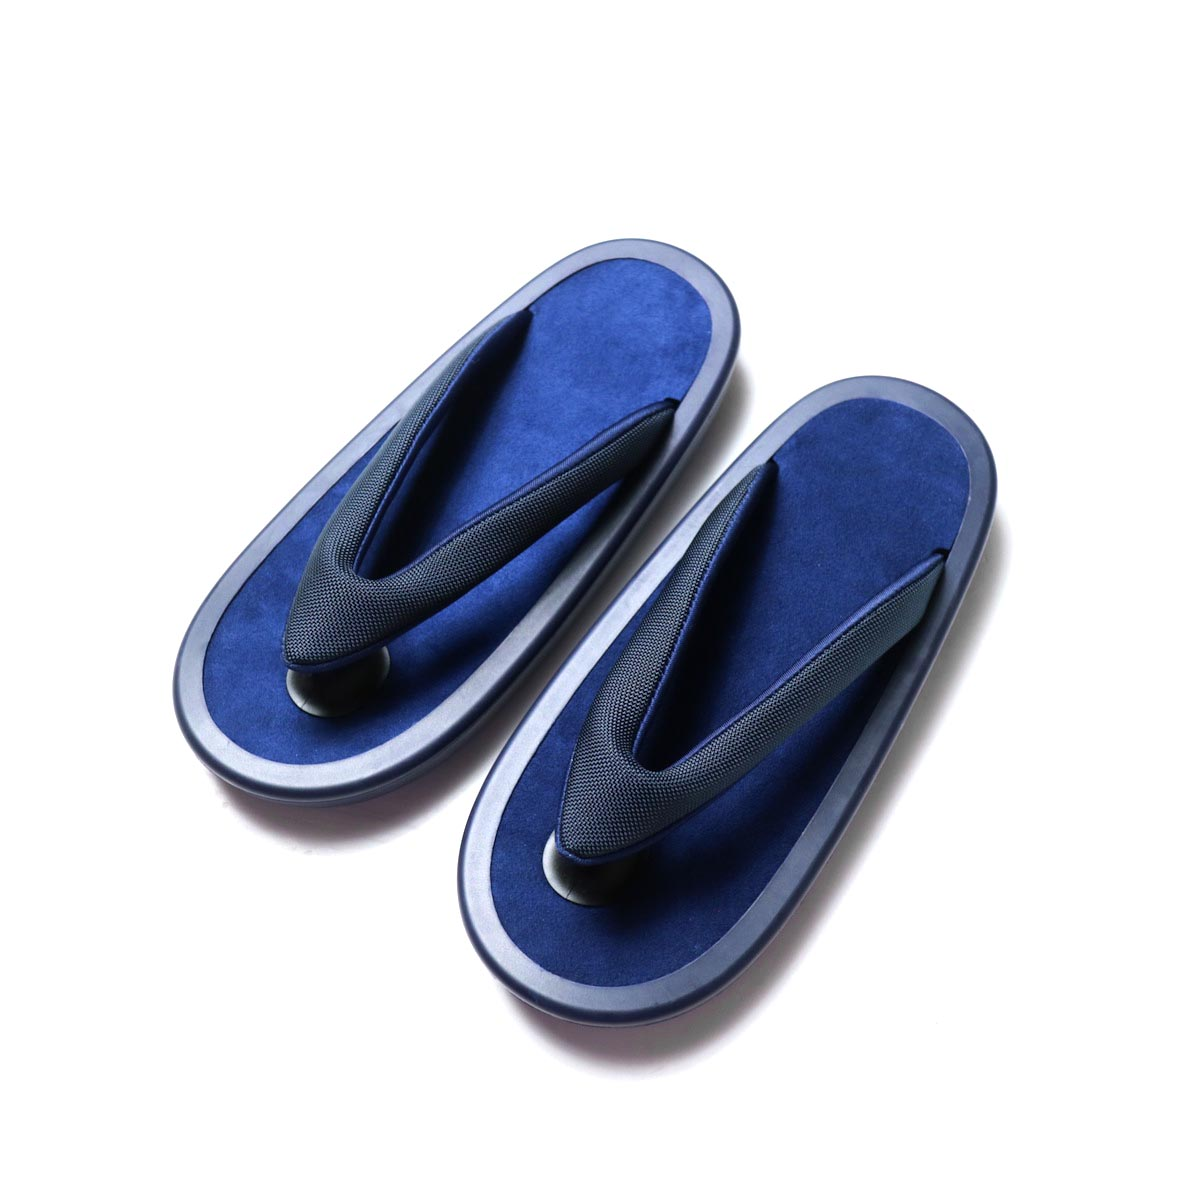 JOJO / Beach Sandal -Black (細鼻緒 / Navy Suede)